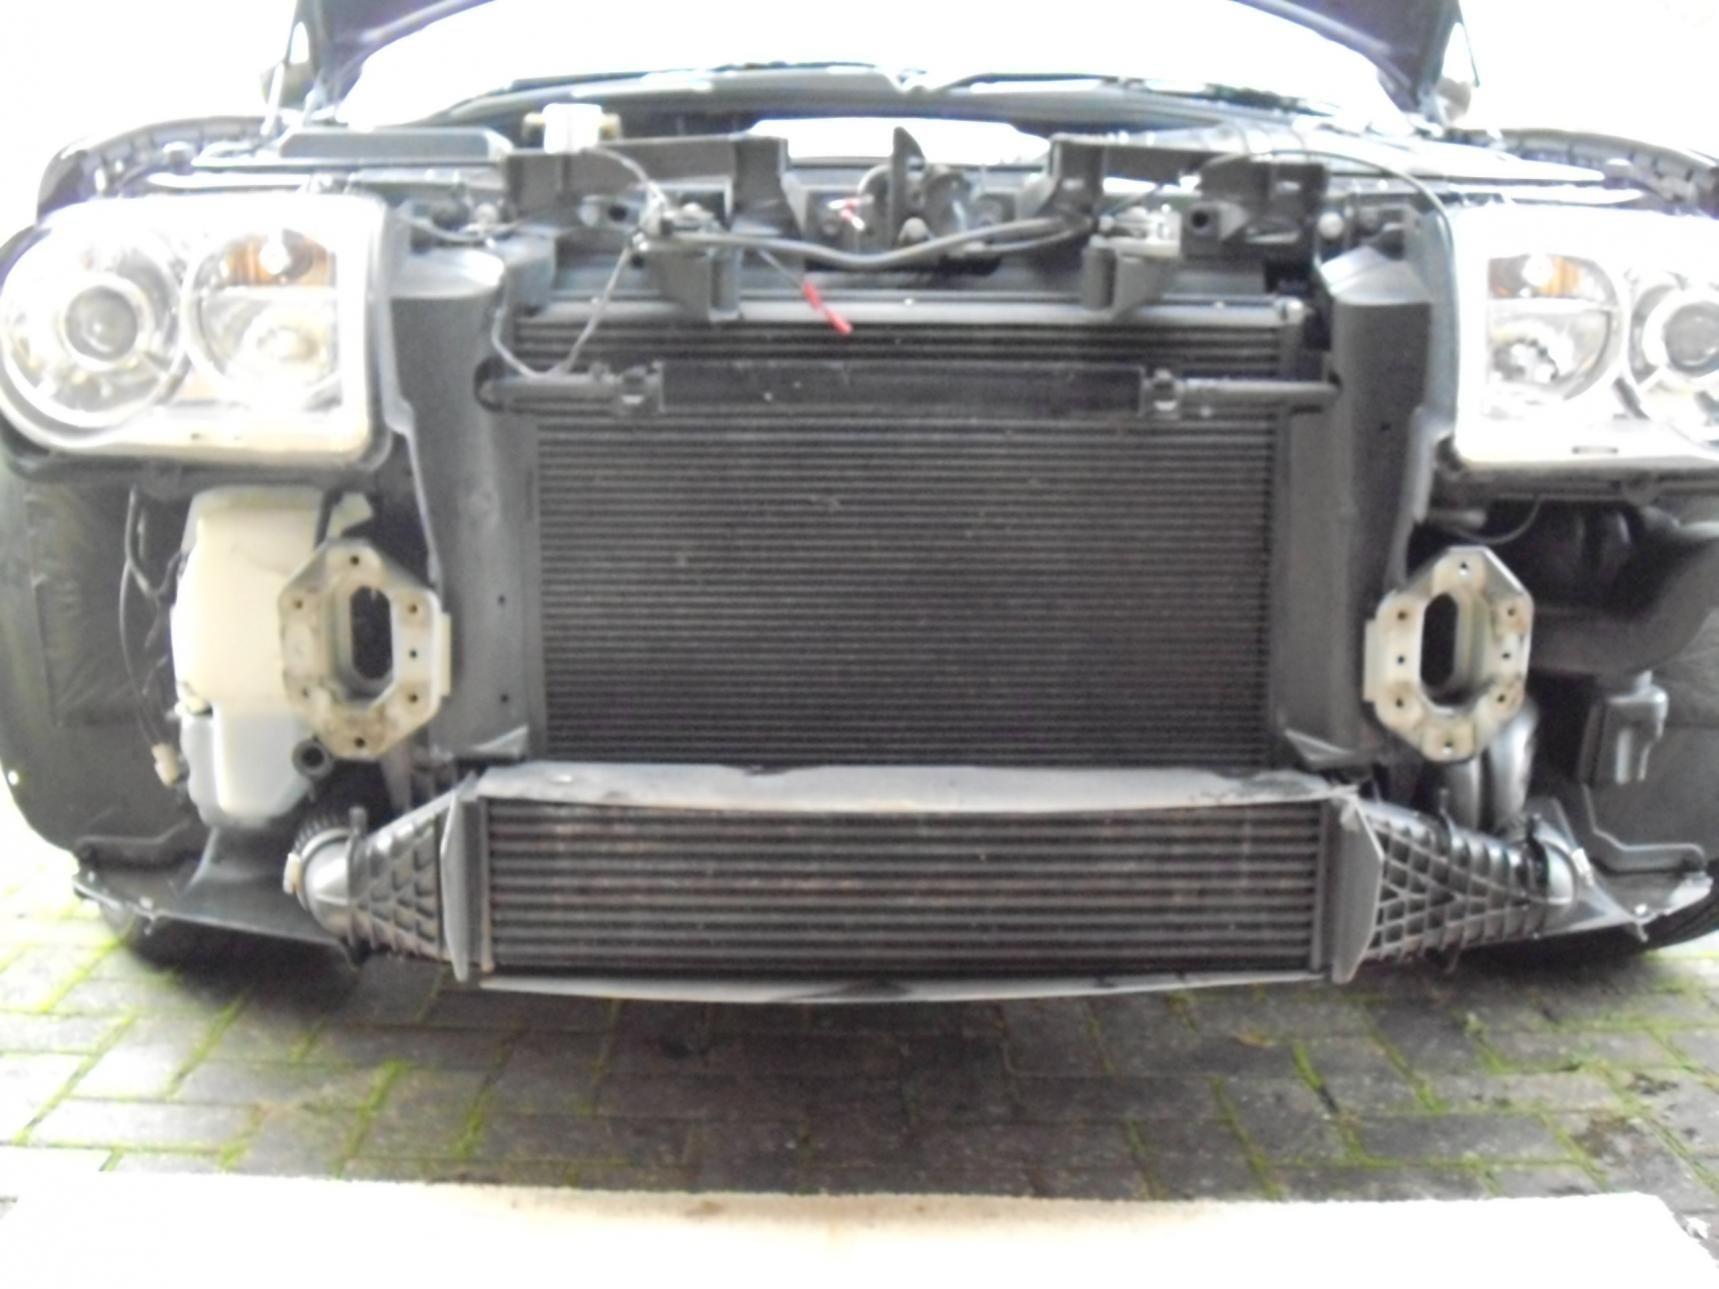 300c crd performance mods chrysler 300c forum 300c for Chrysler 300c crd